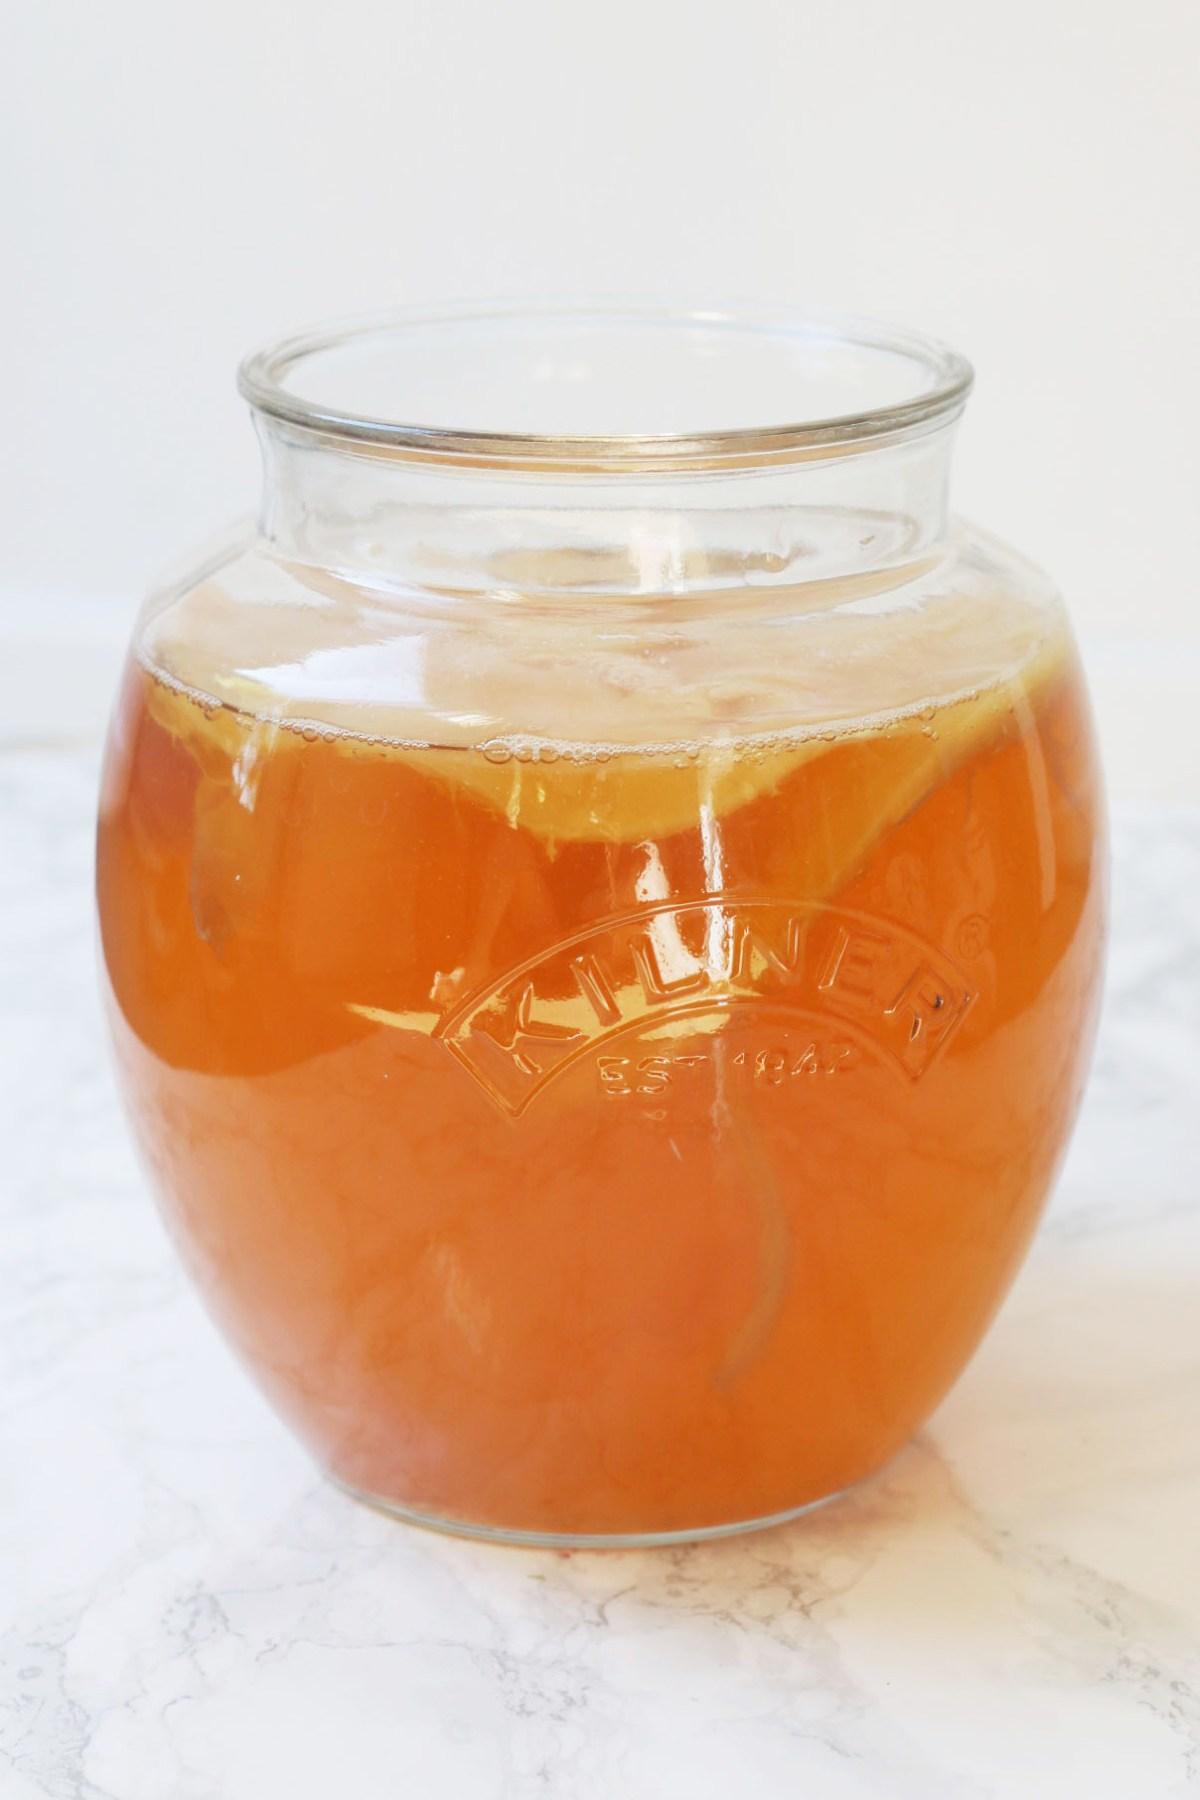 A jar of kombucha